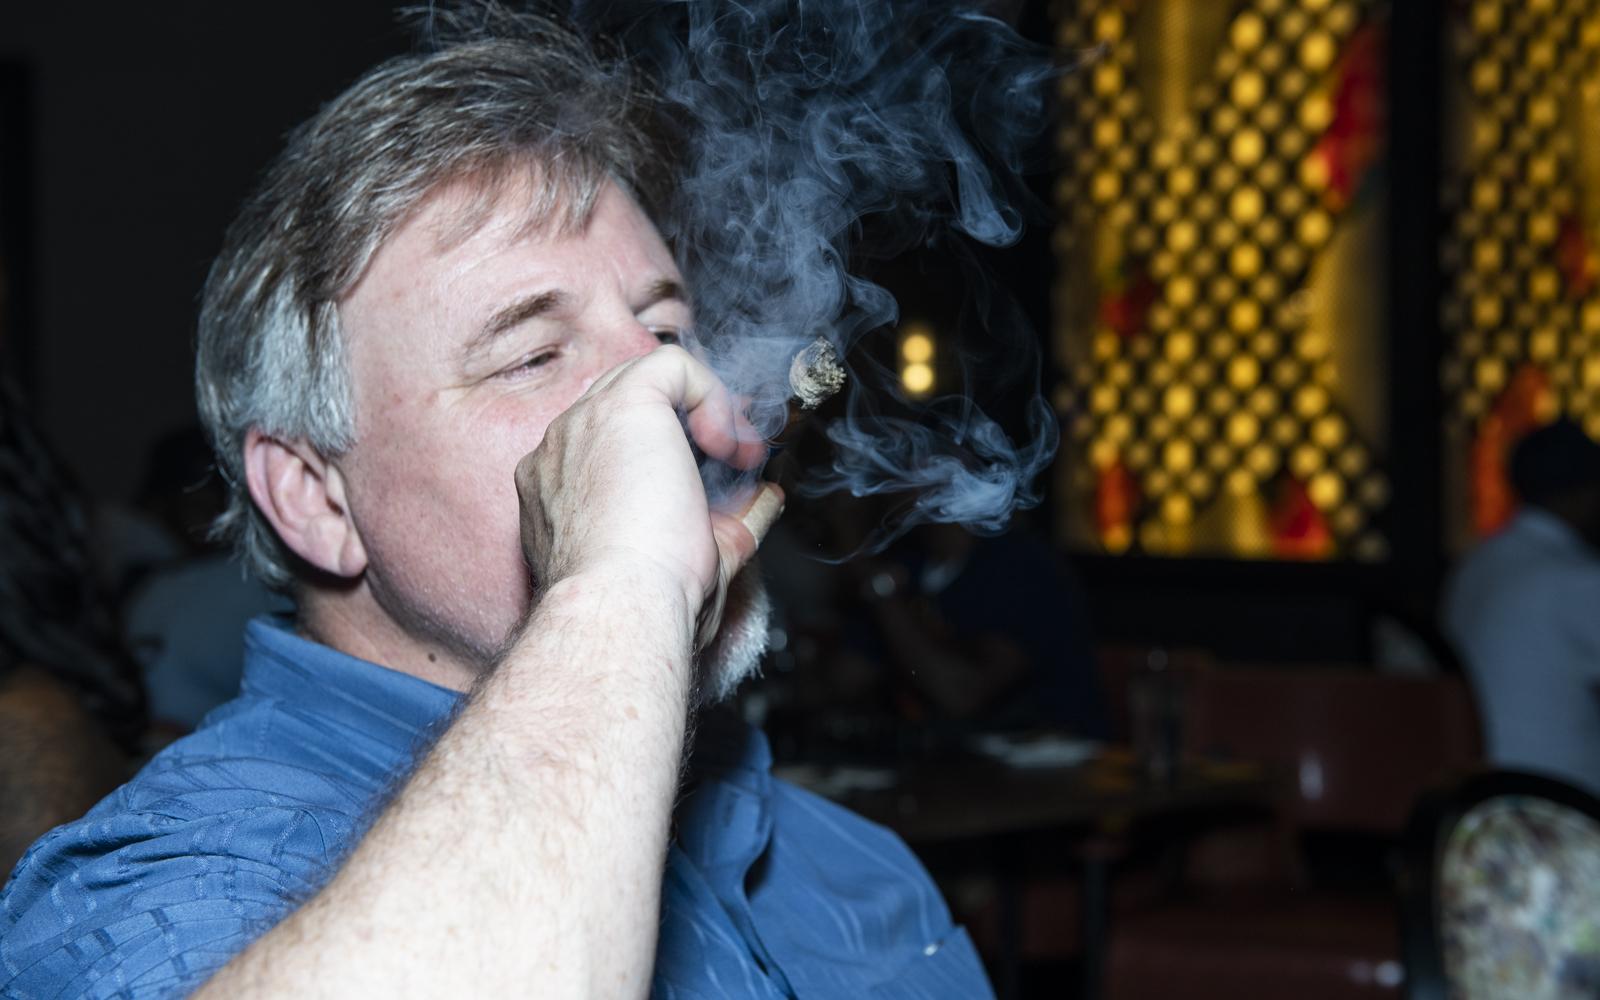 Burn-atlanta-cigar-7810.jpg